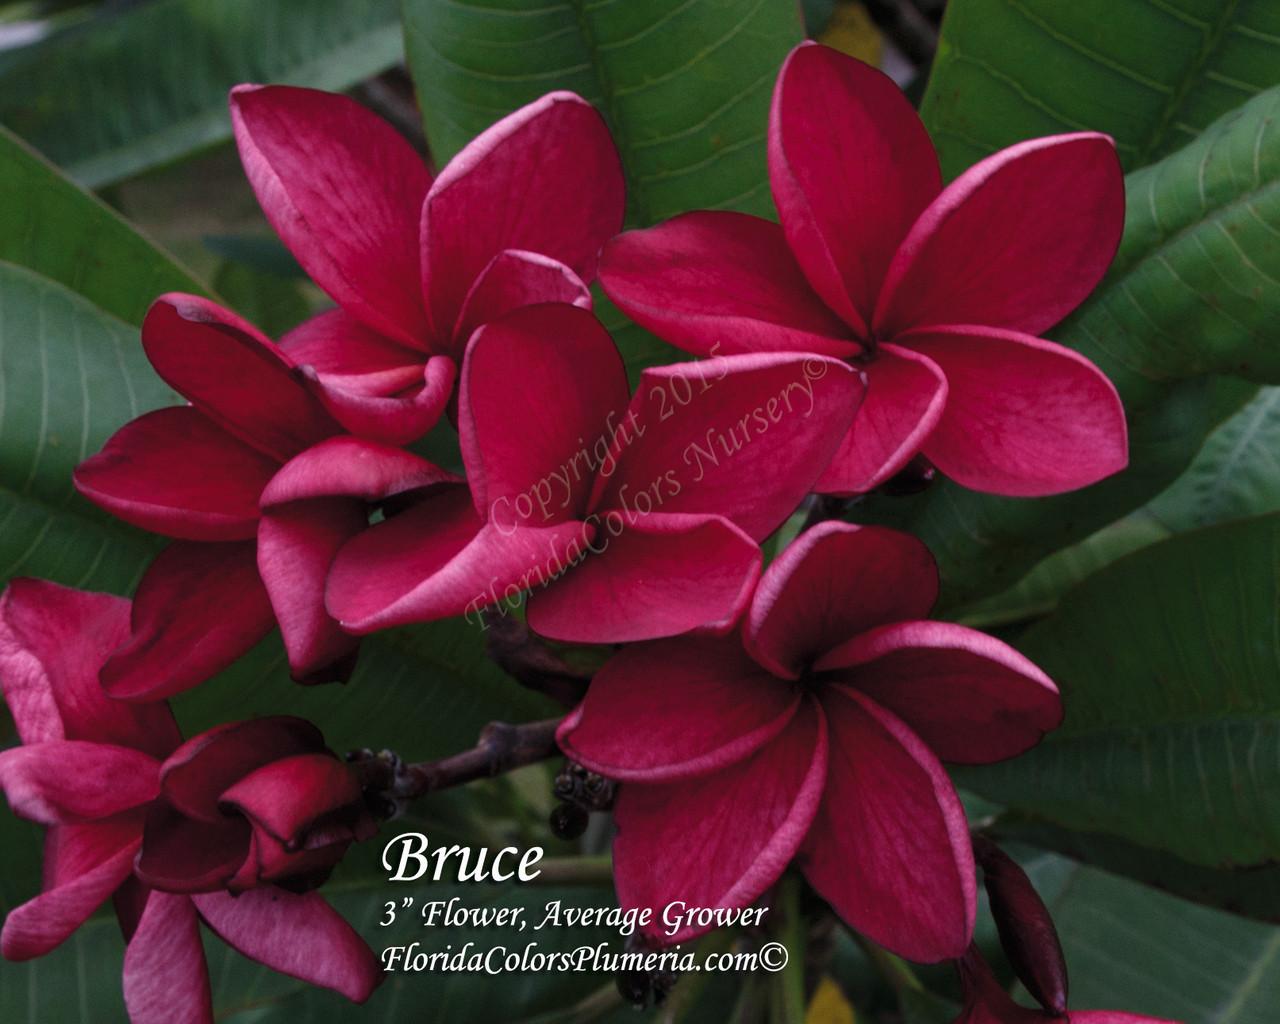 Bruce Plumeria - Plumeria by Florida Colors Nursery